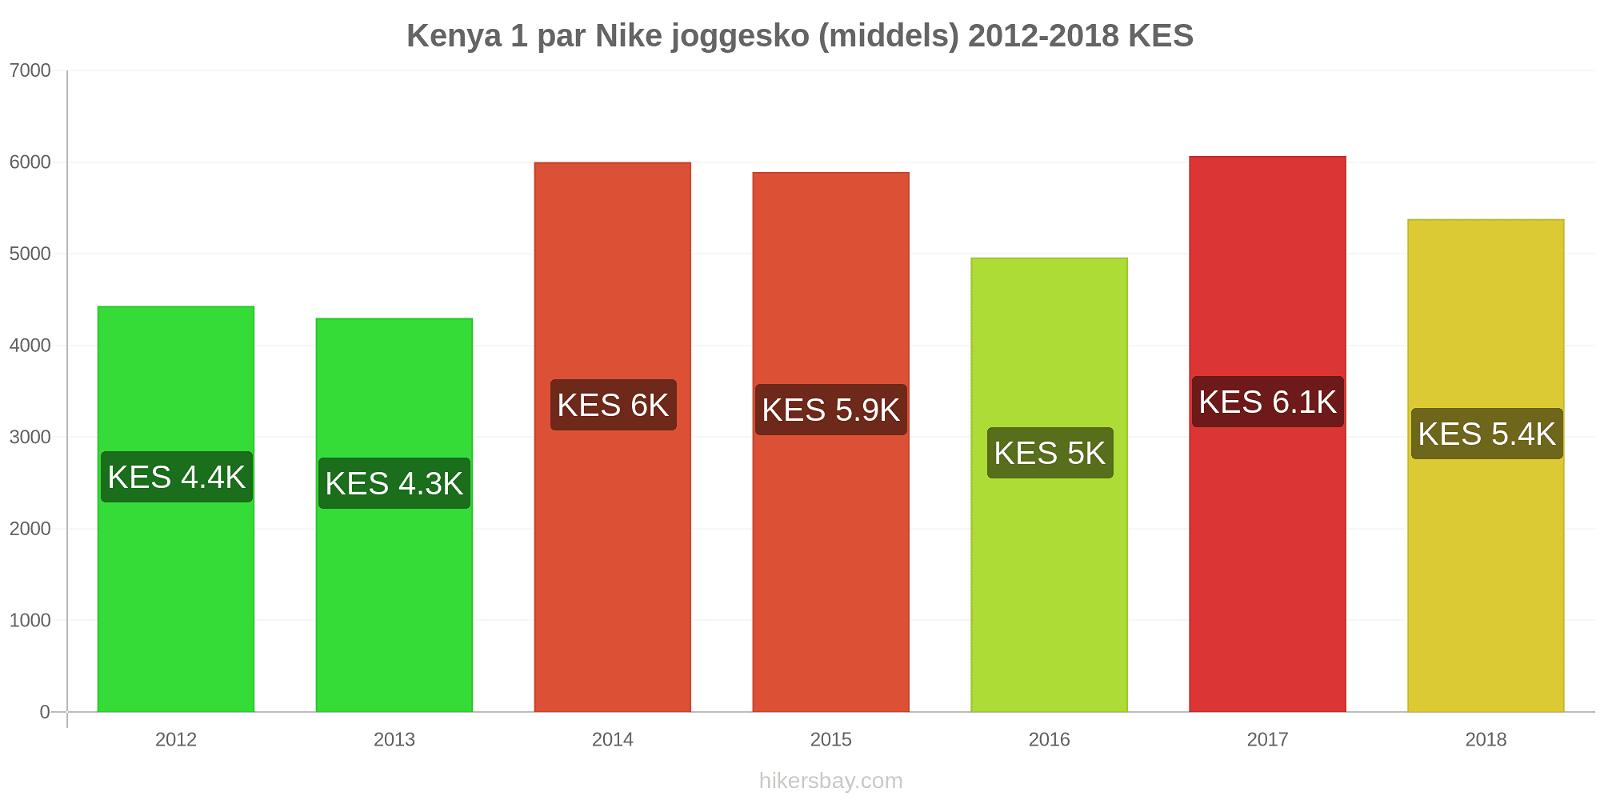 Kenya prisendringer 1 par Nike joggesko (middels) hikersbay.com